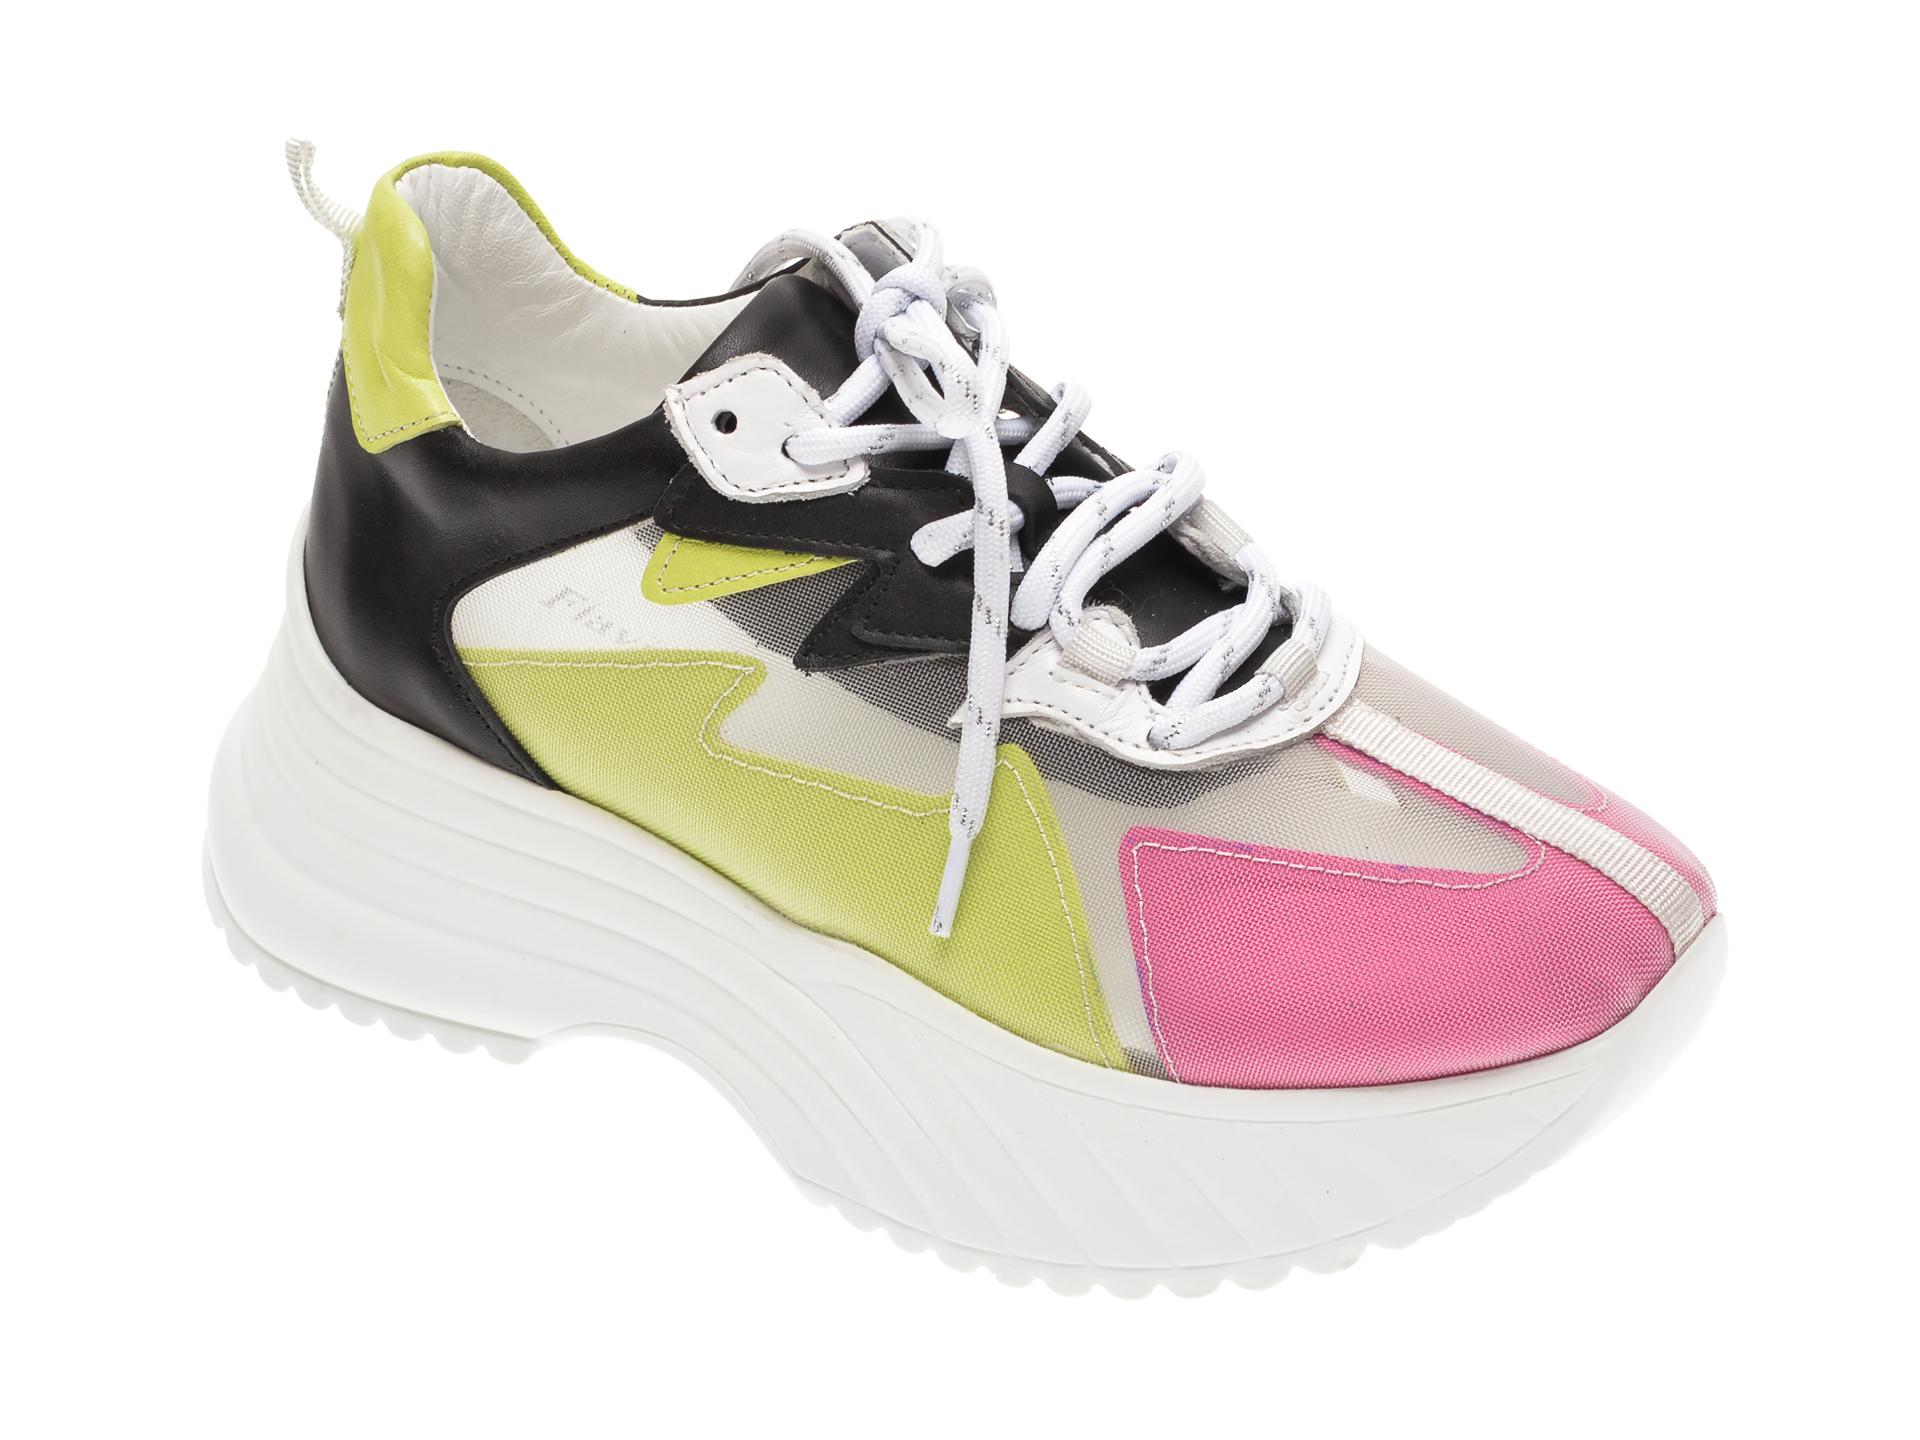 Pantofi sport FLAVIA PASSINI multicolor, 135304, din material textil si piele naturala